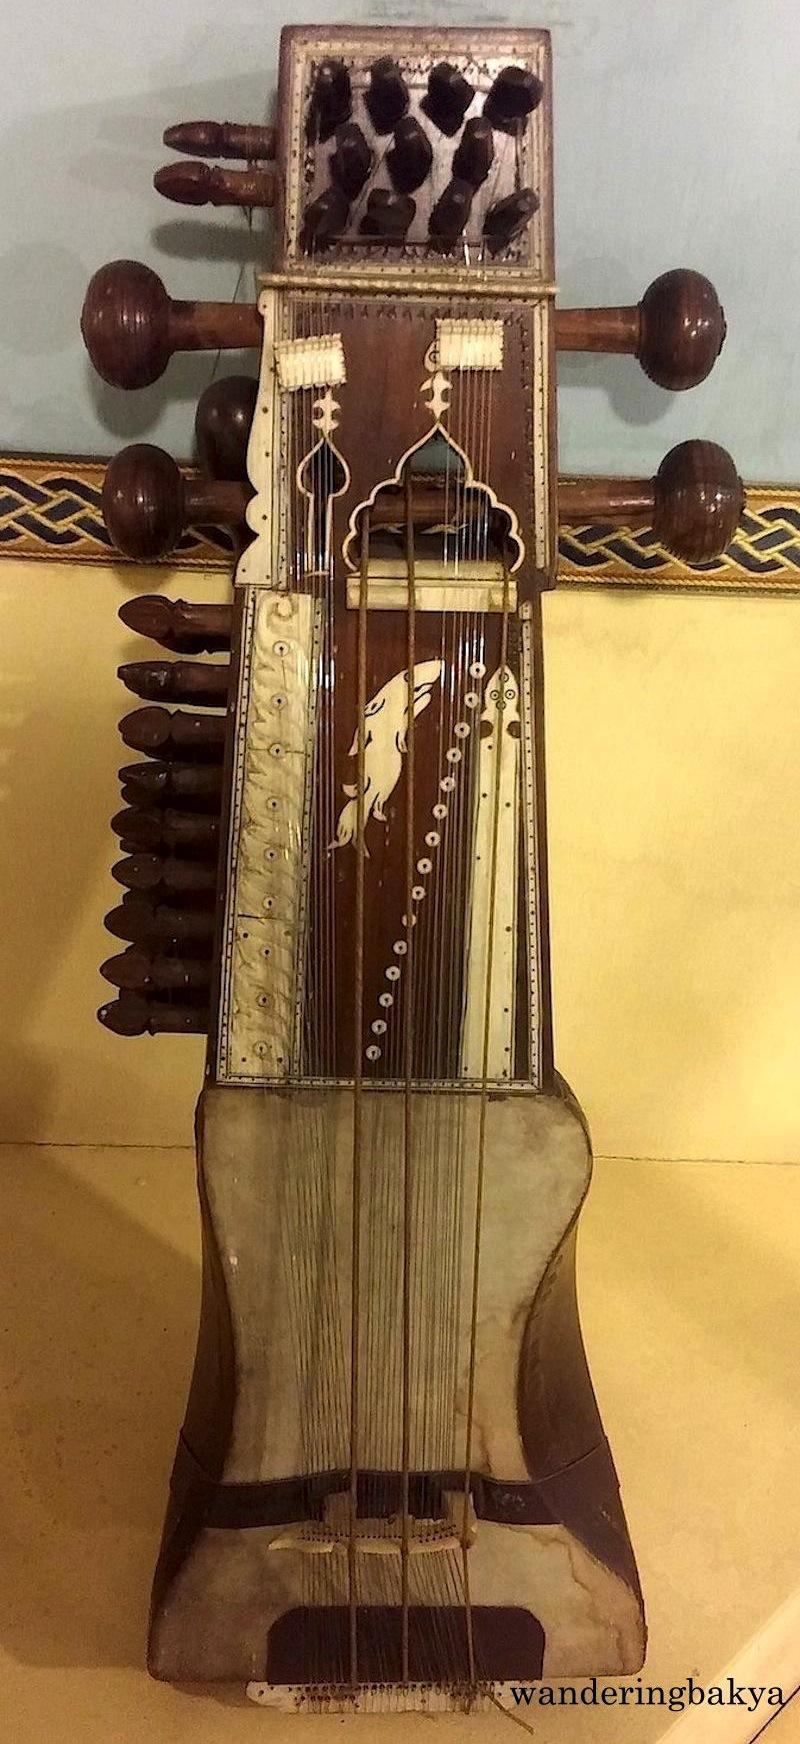 Indian Traditional Musical Instruments – Wandering Bakya